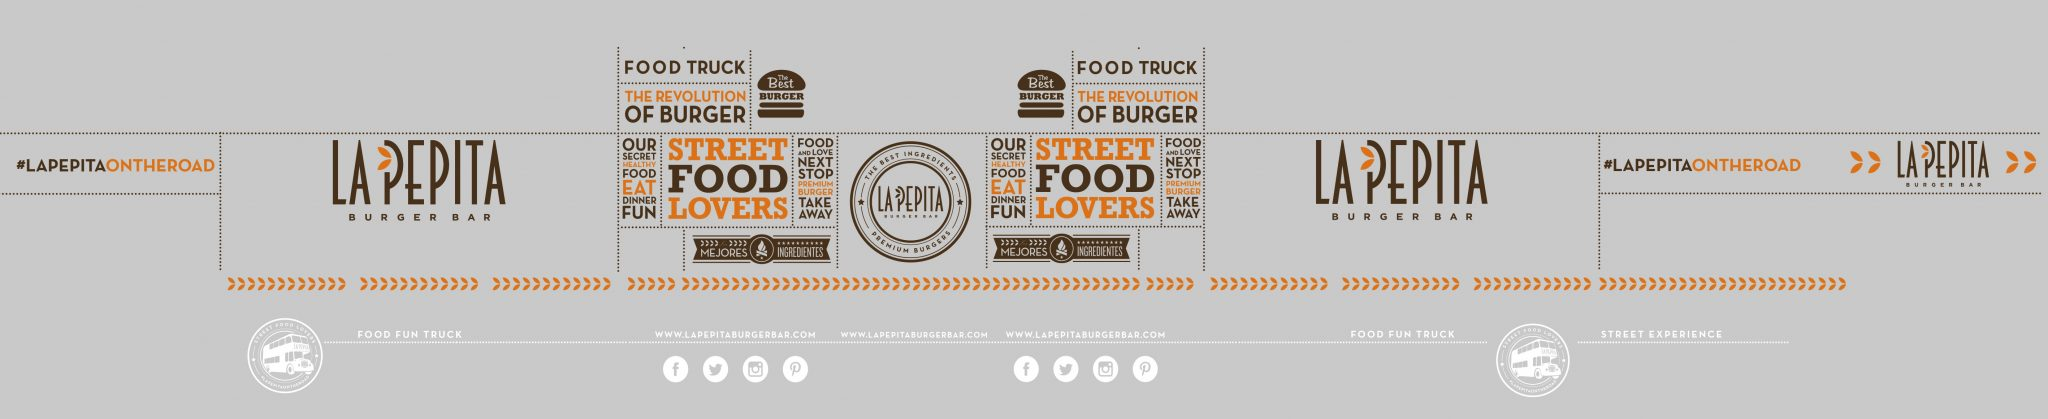 imagen-corporativa-la-pepita-burger-bar